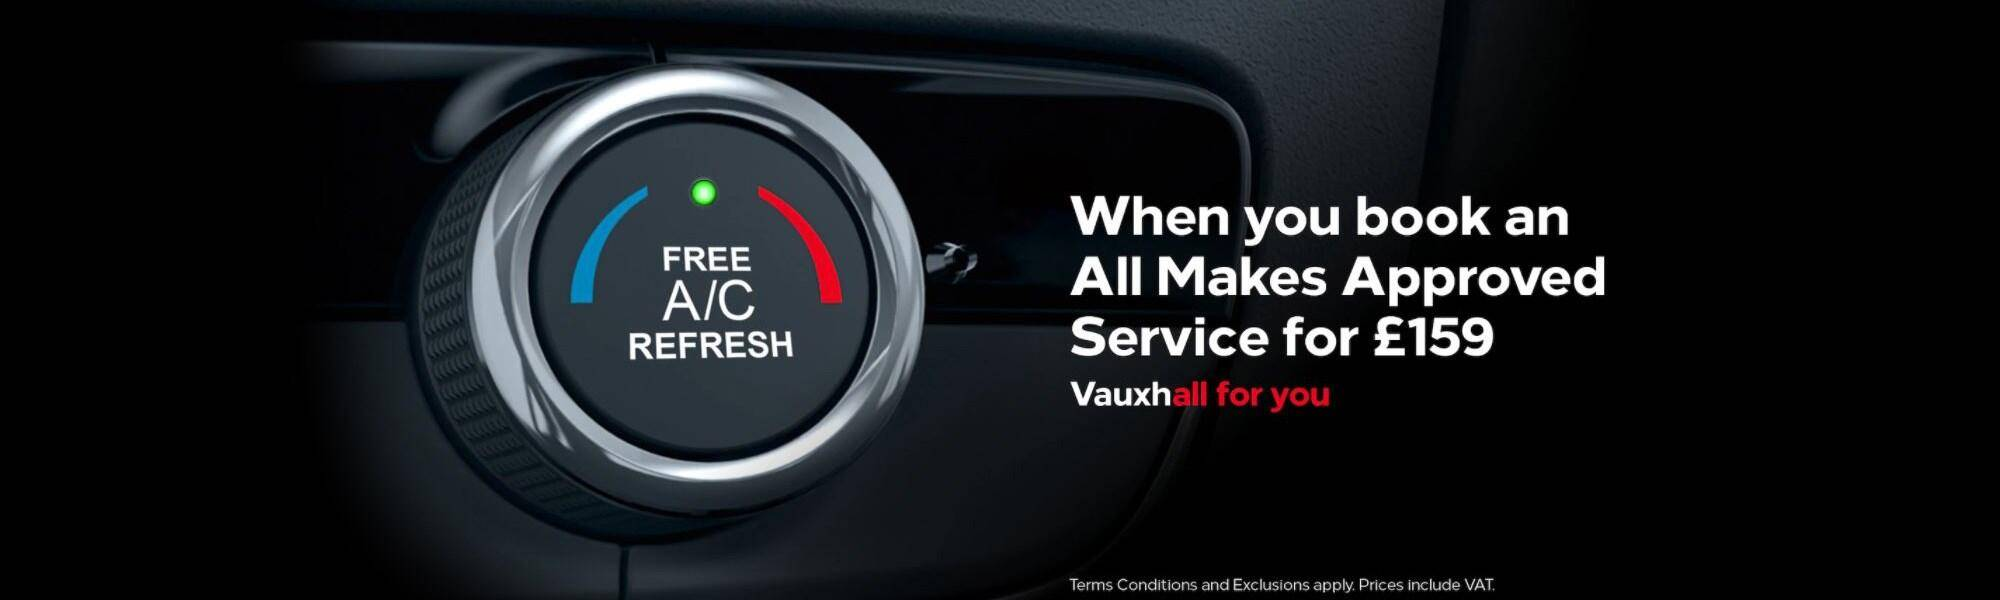 Vauxhall Free Air-Con Refresh